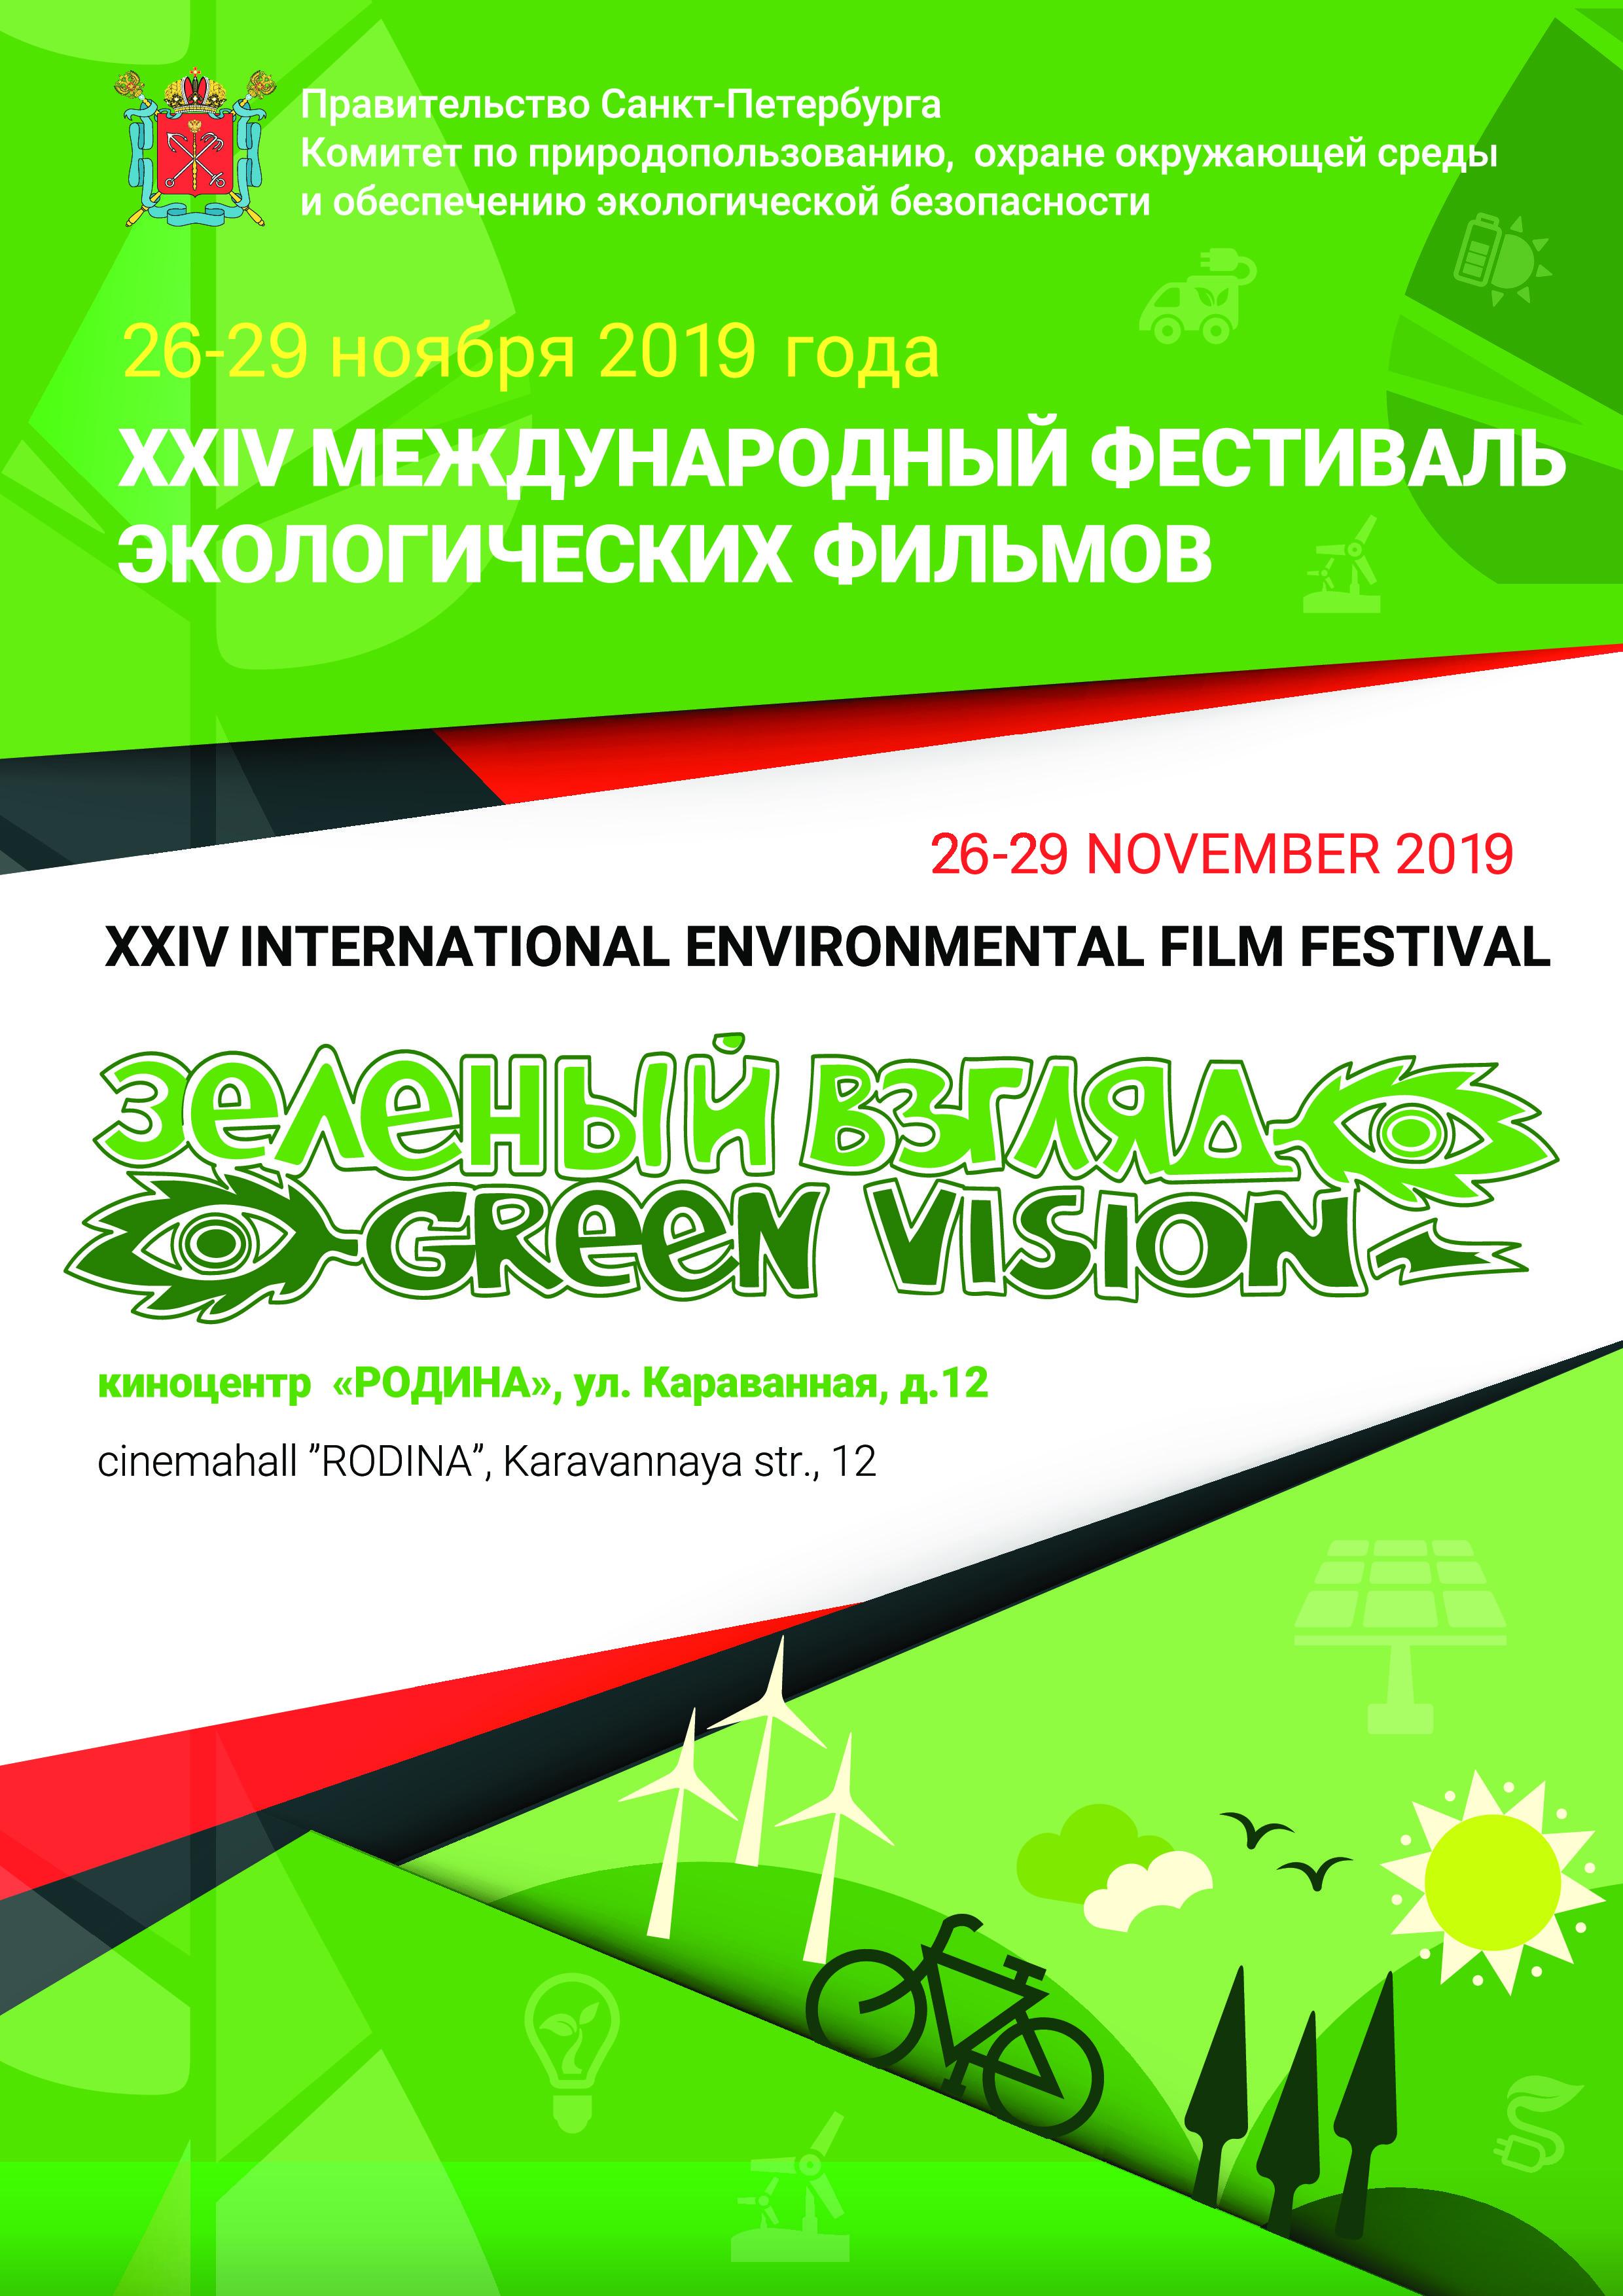 http://ecopeterburg.ru/wp-content/uploads/2019/08/GreenVision_2018_Afisha_2-pdf.io_.jpg